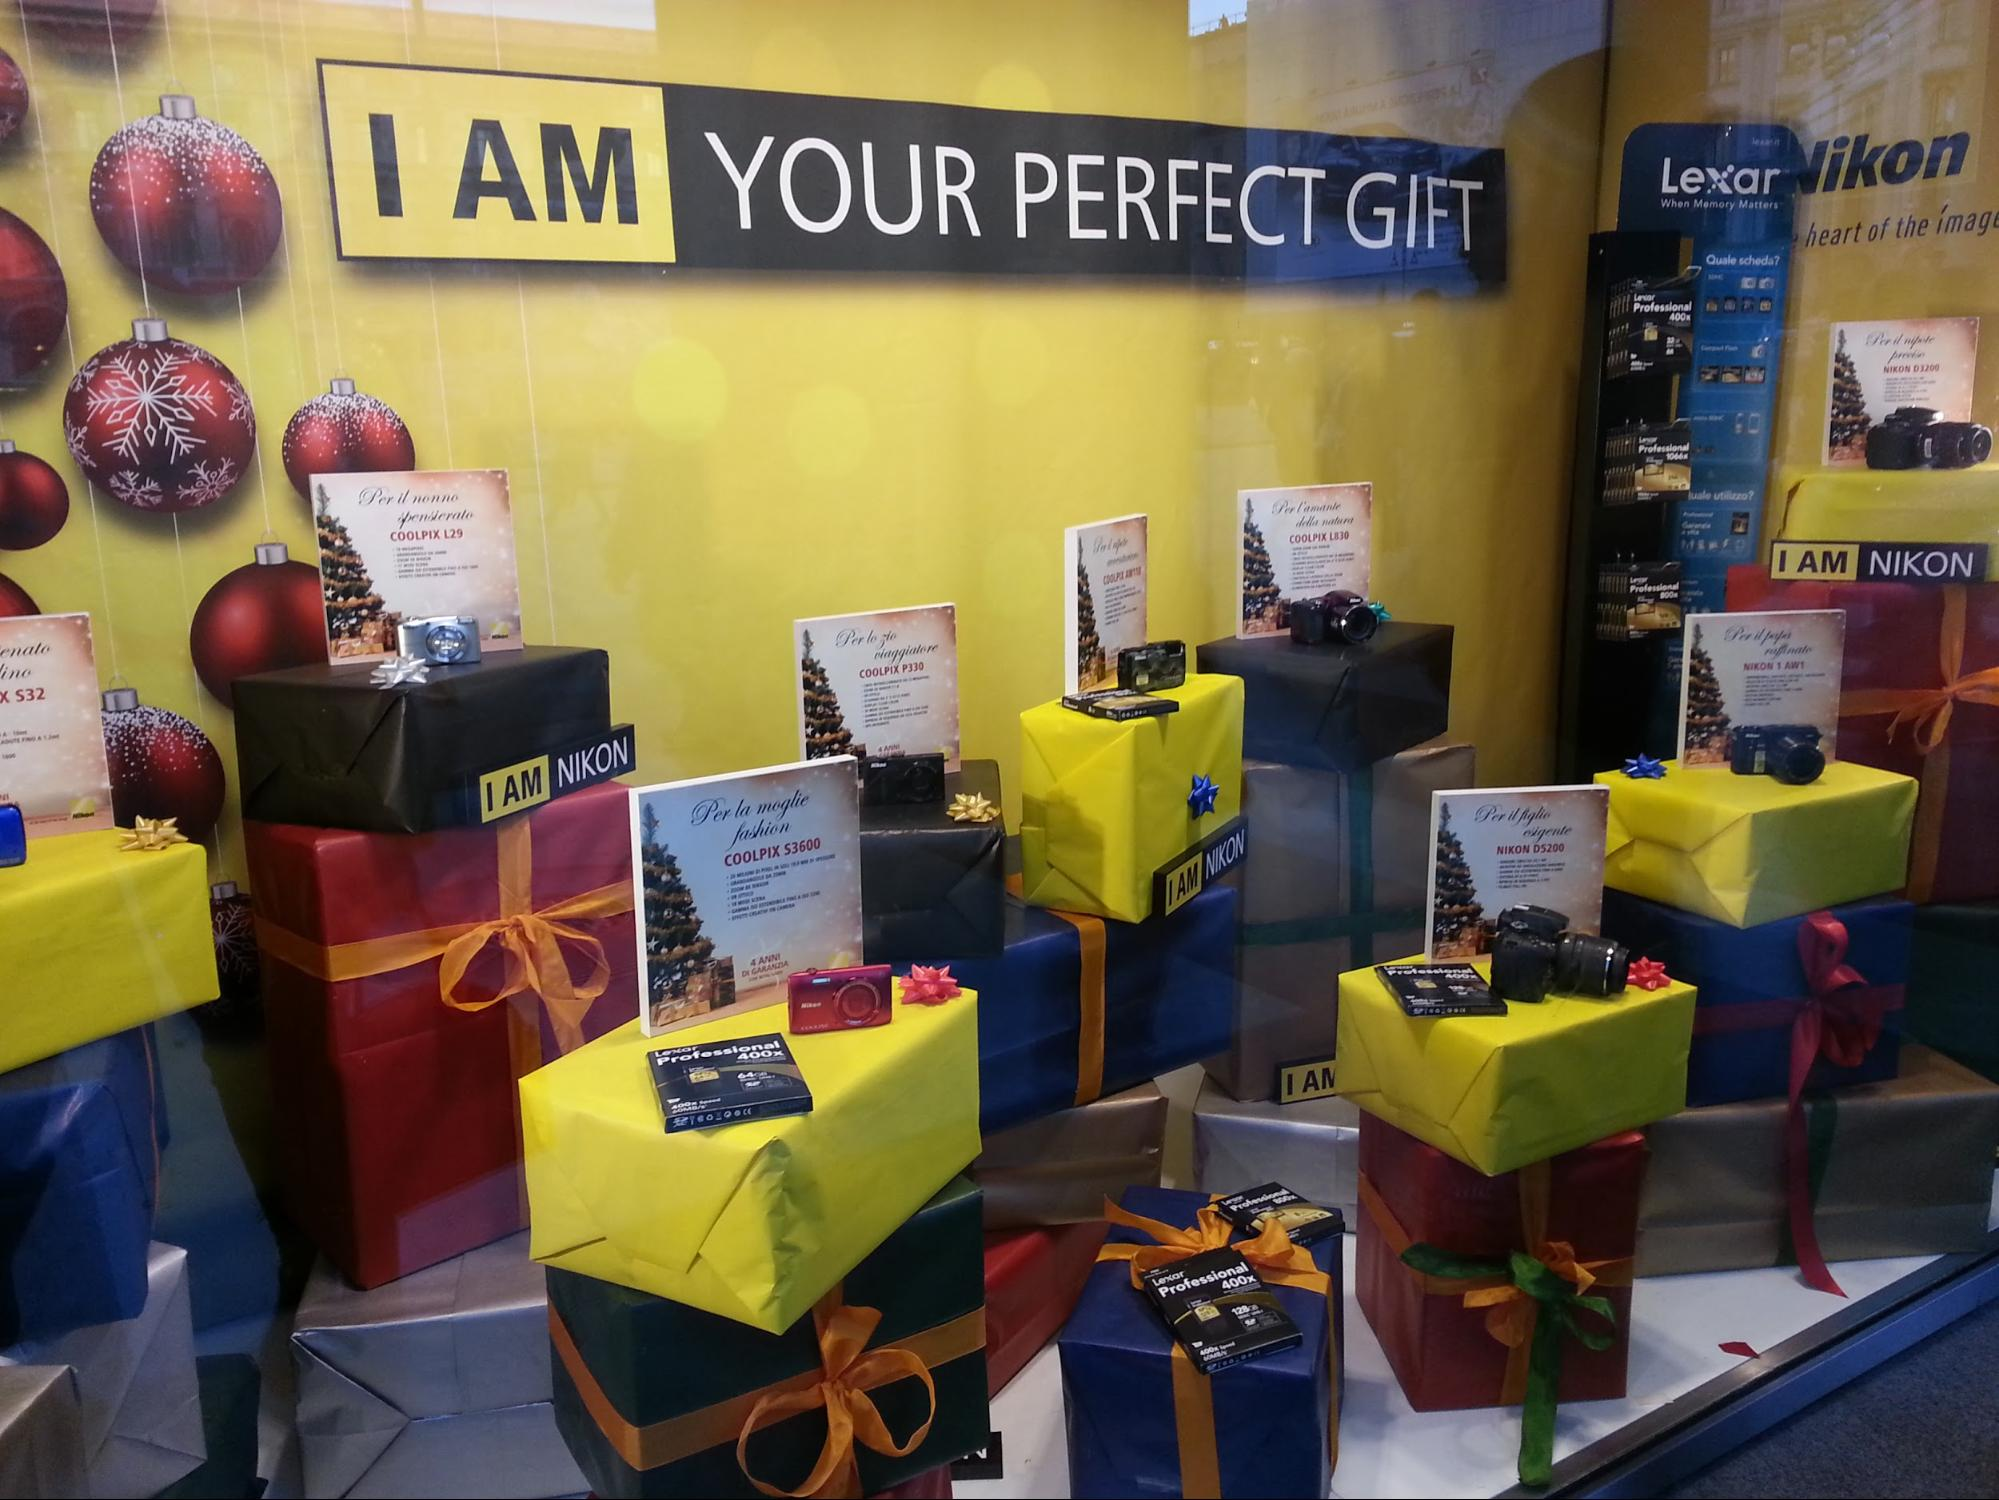 parlare di regali per le Frasi per vetrine natalizie